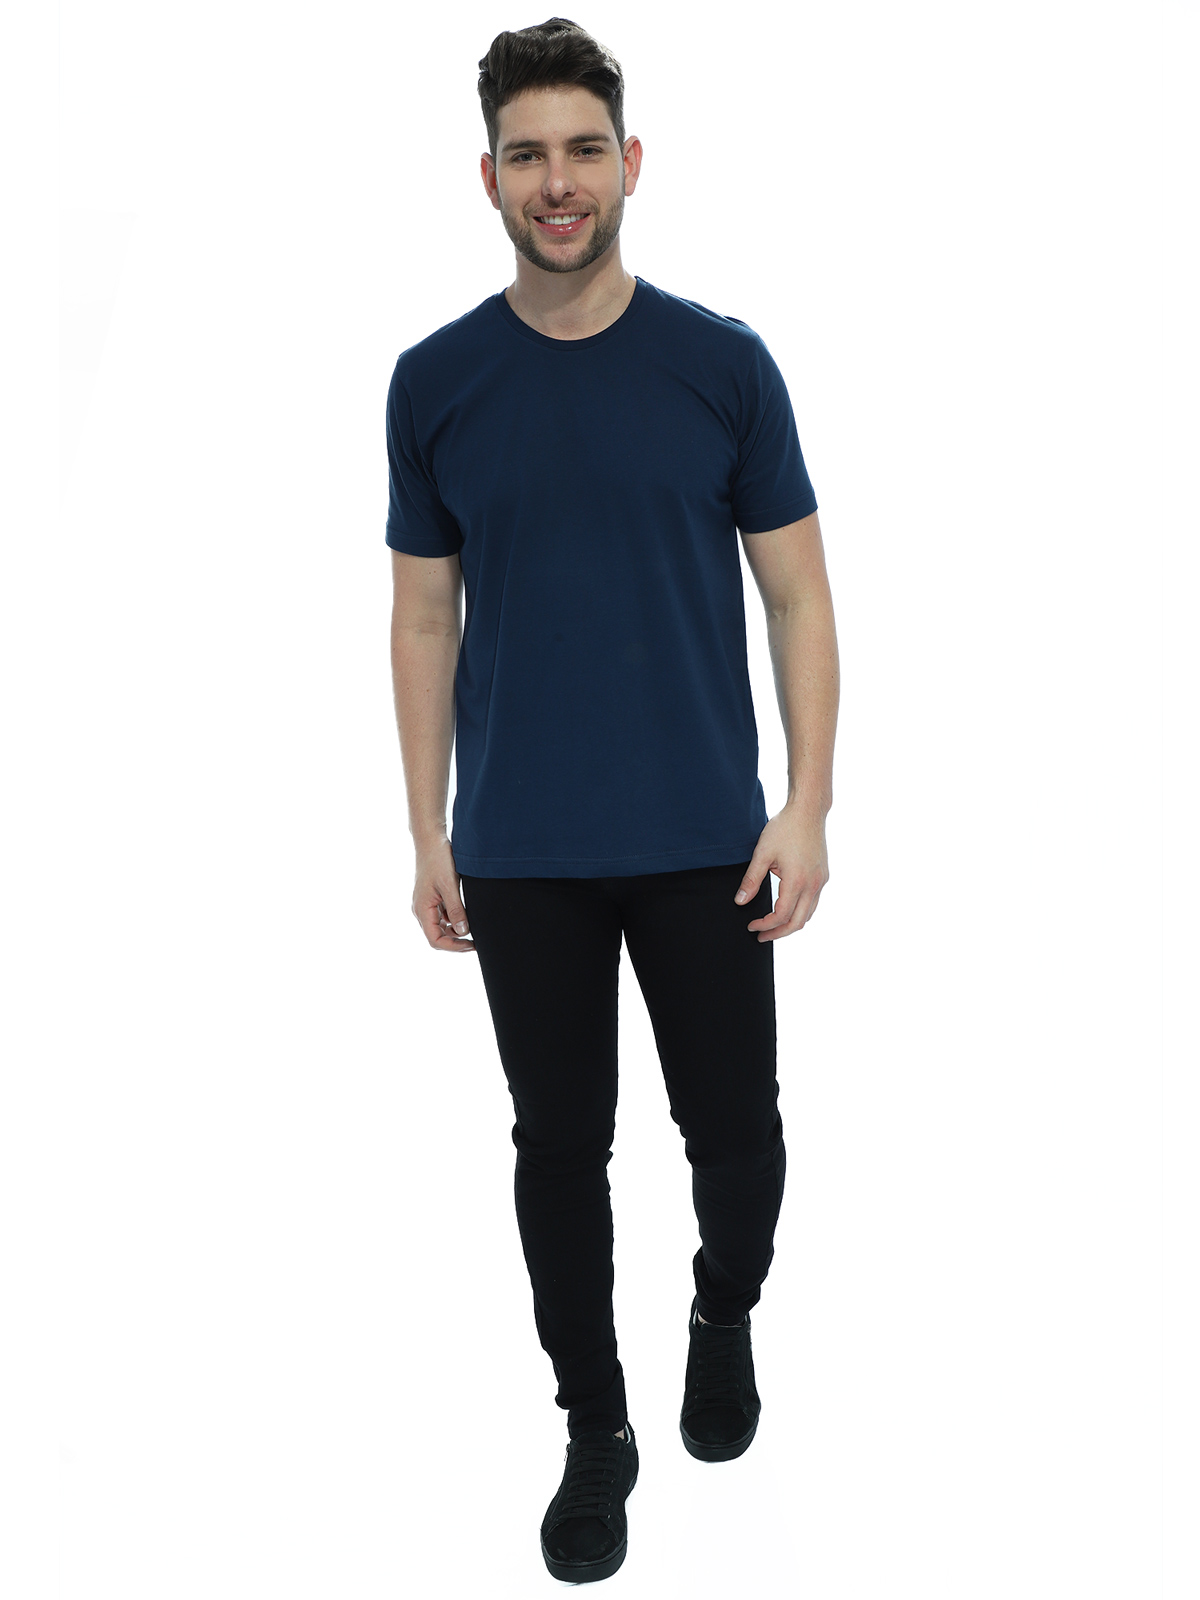 Camiseta Masculina Algodão Manga Curta Básica Lisa Marinho